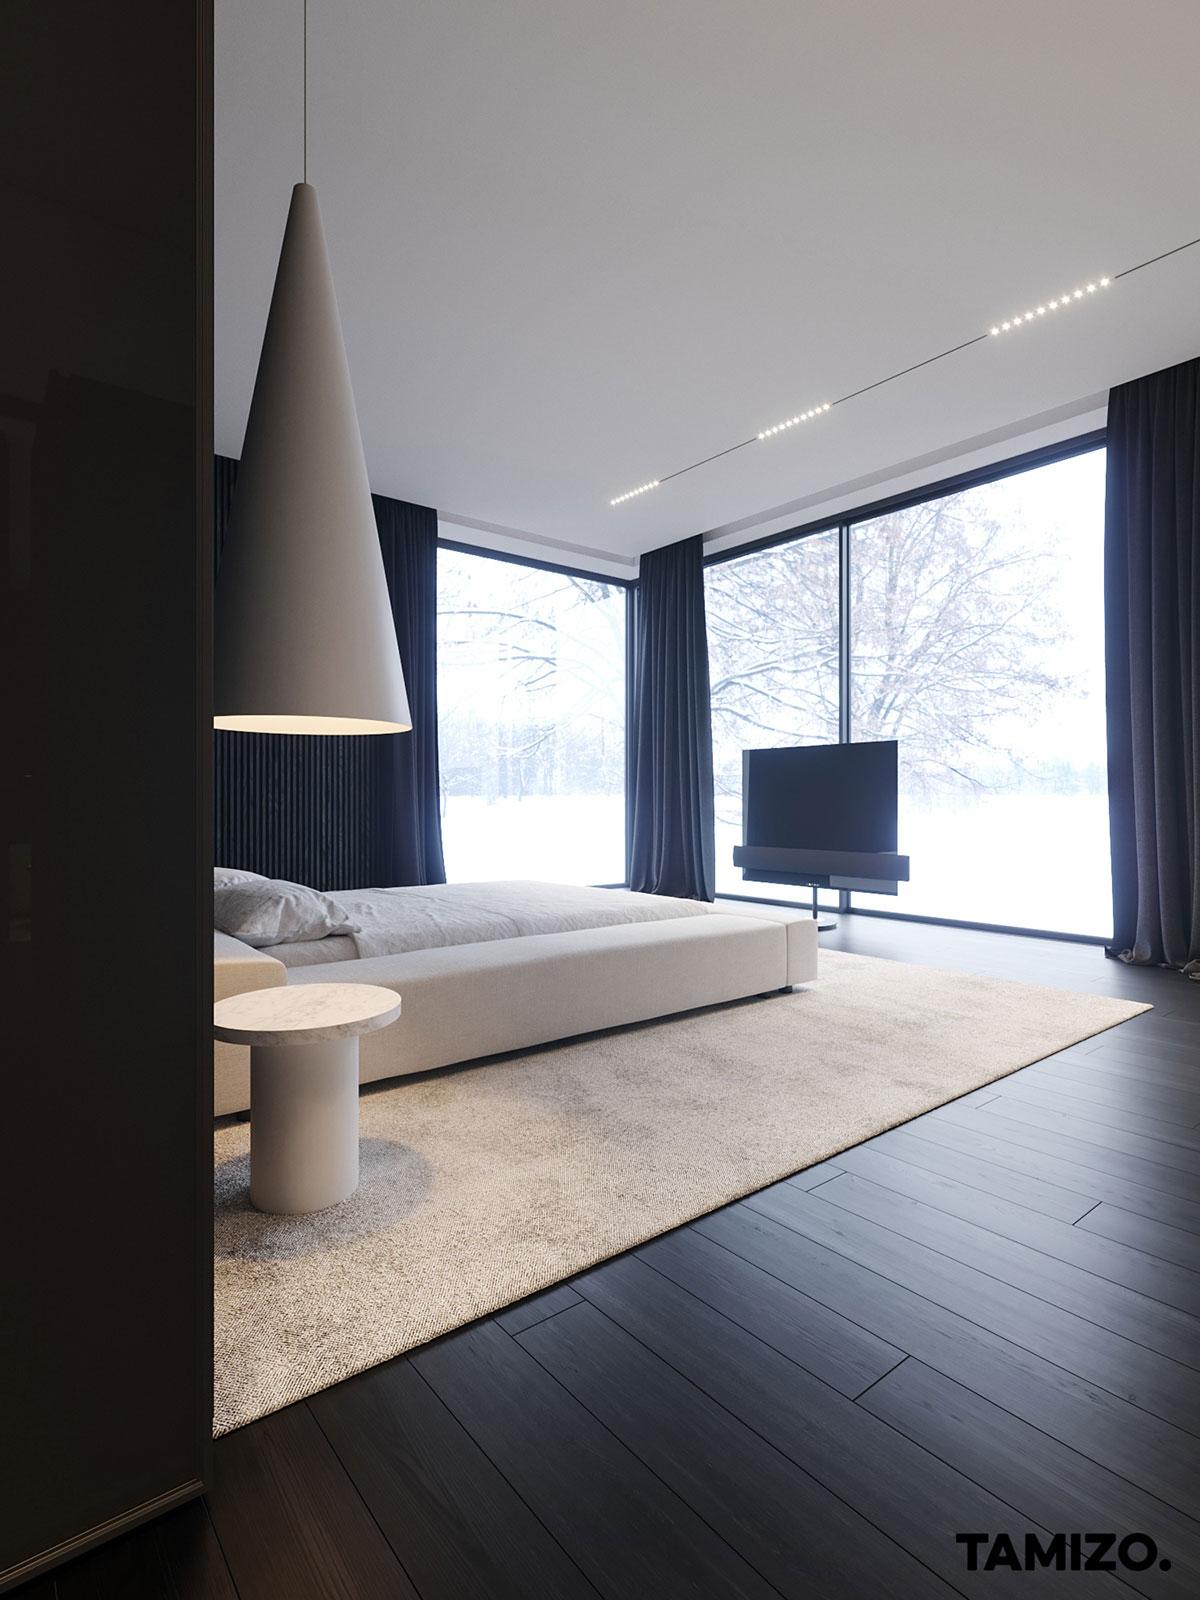 tamizo_architects_mateusz_kuo_stolarski_tomaszow_mazowiecki_interior_design_house_minimal_08